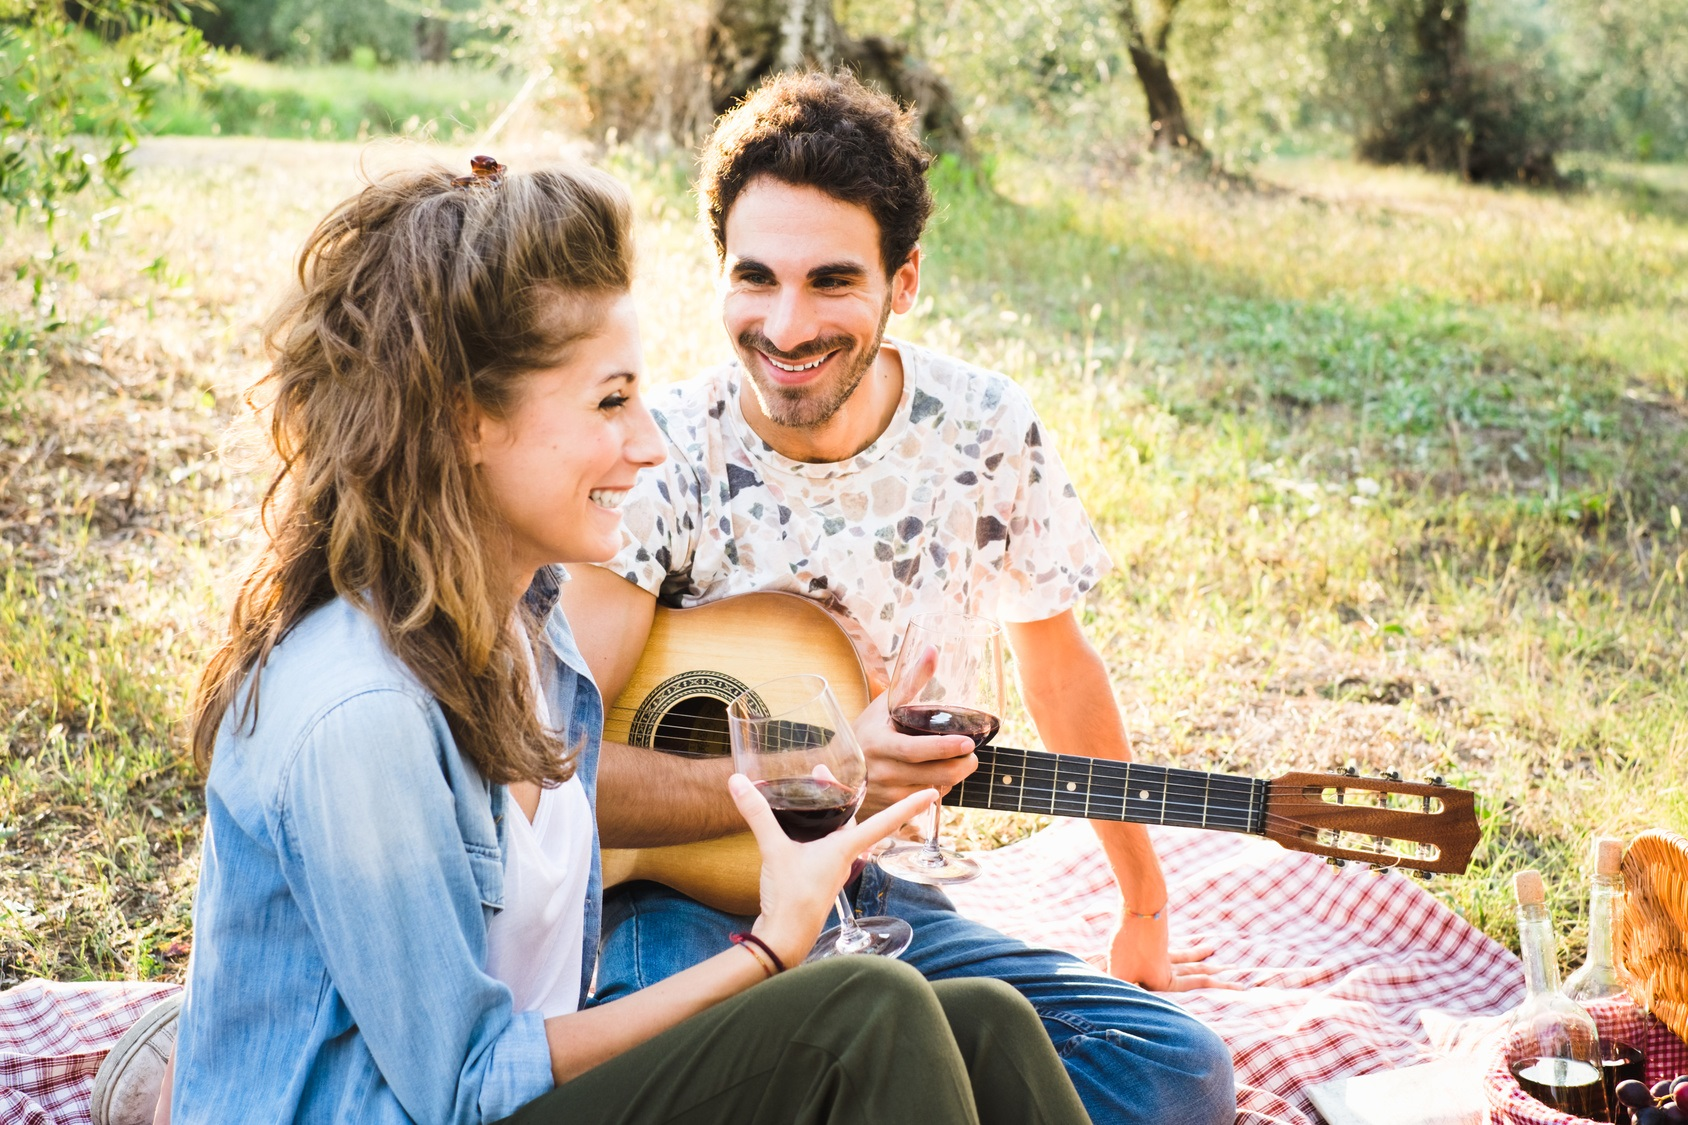 Paar genießt Picknick im Freien